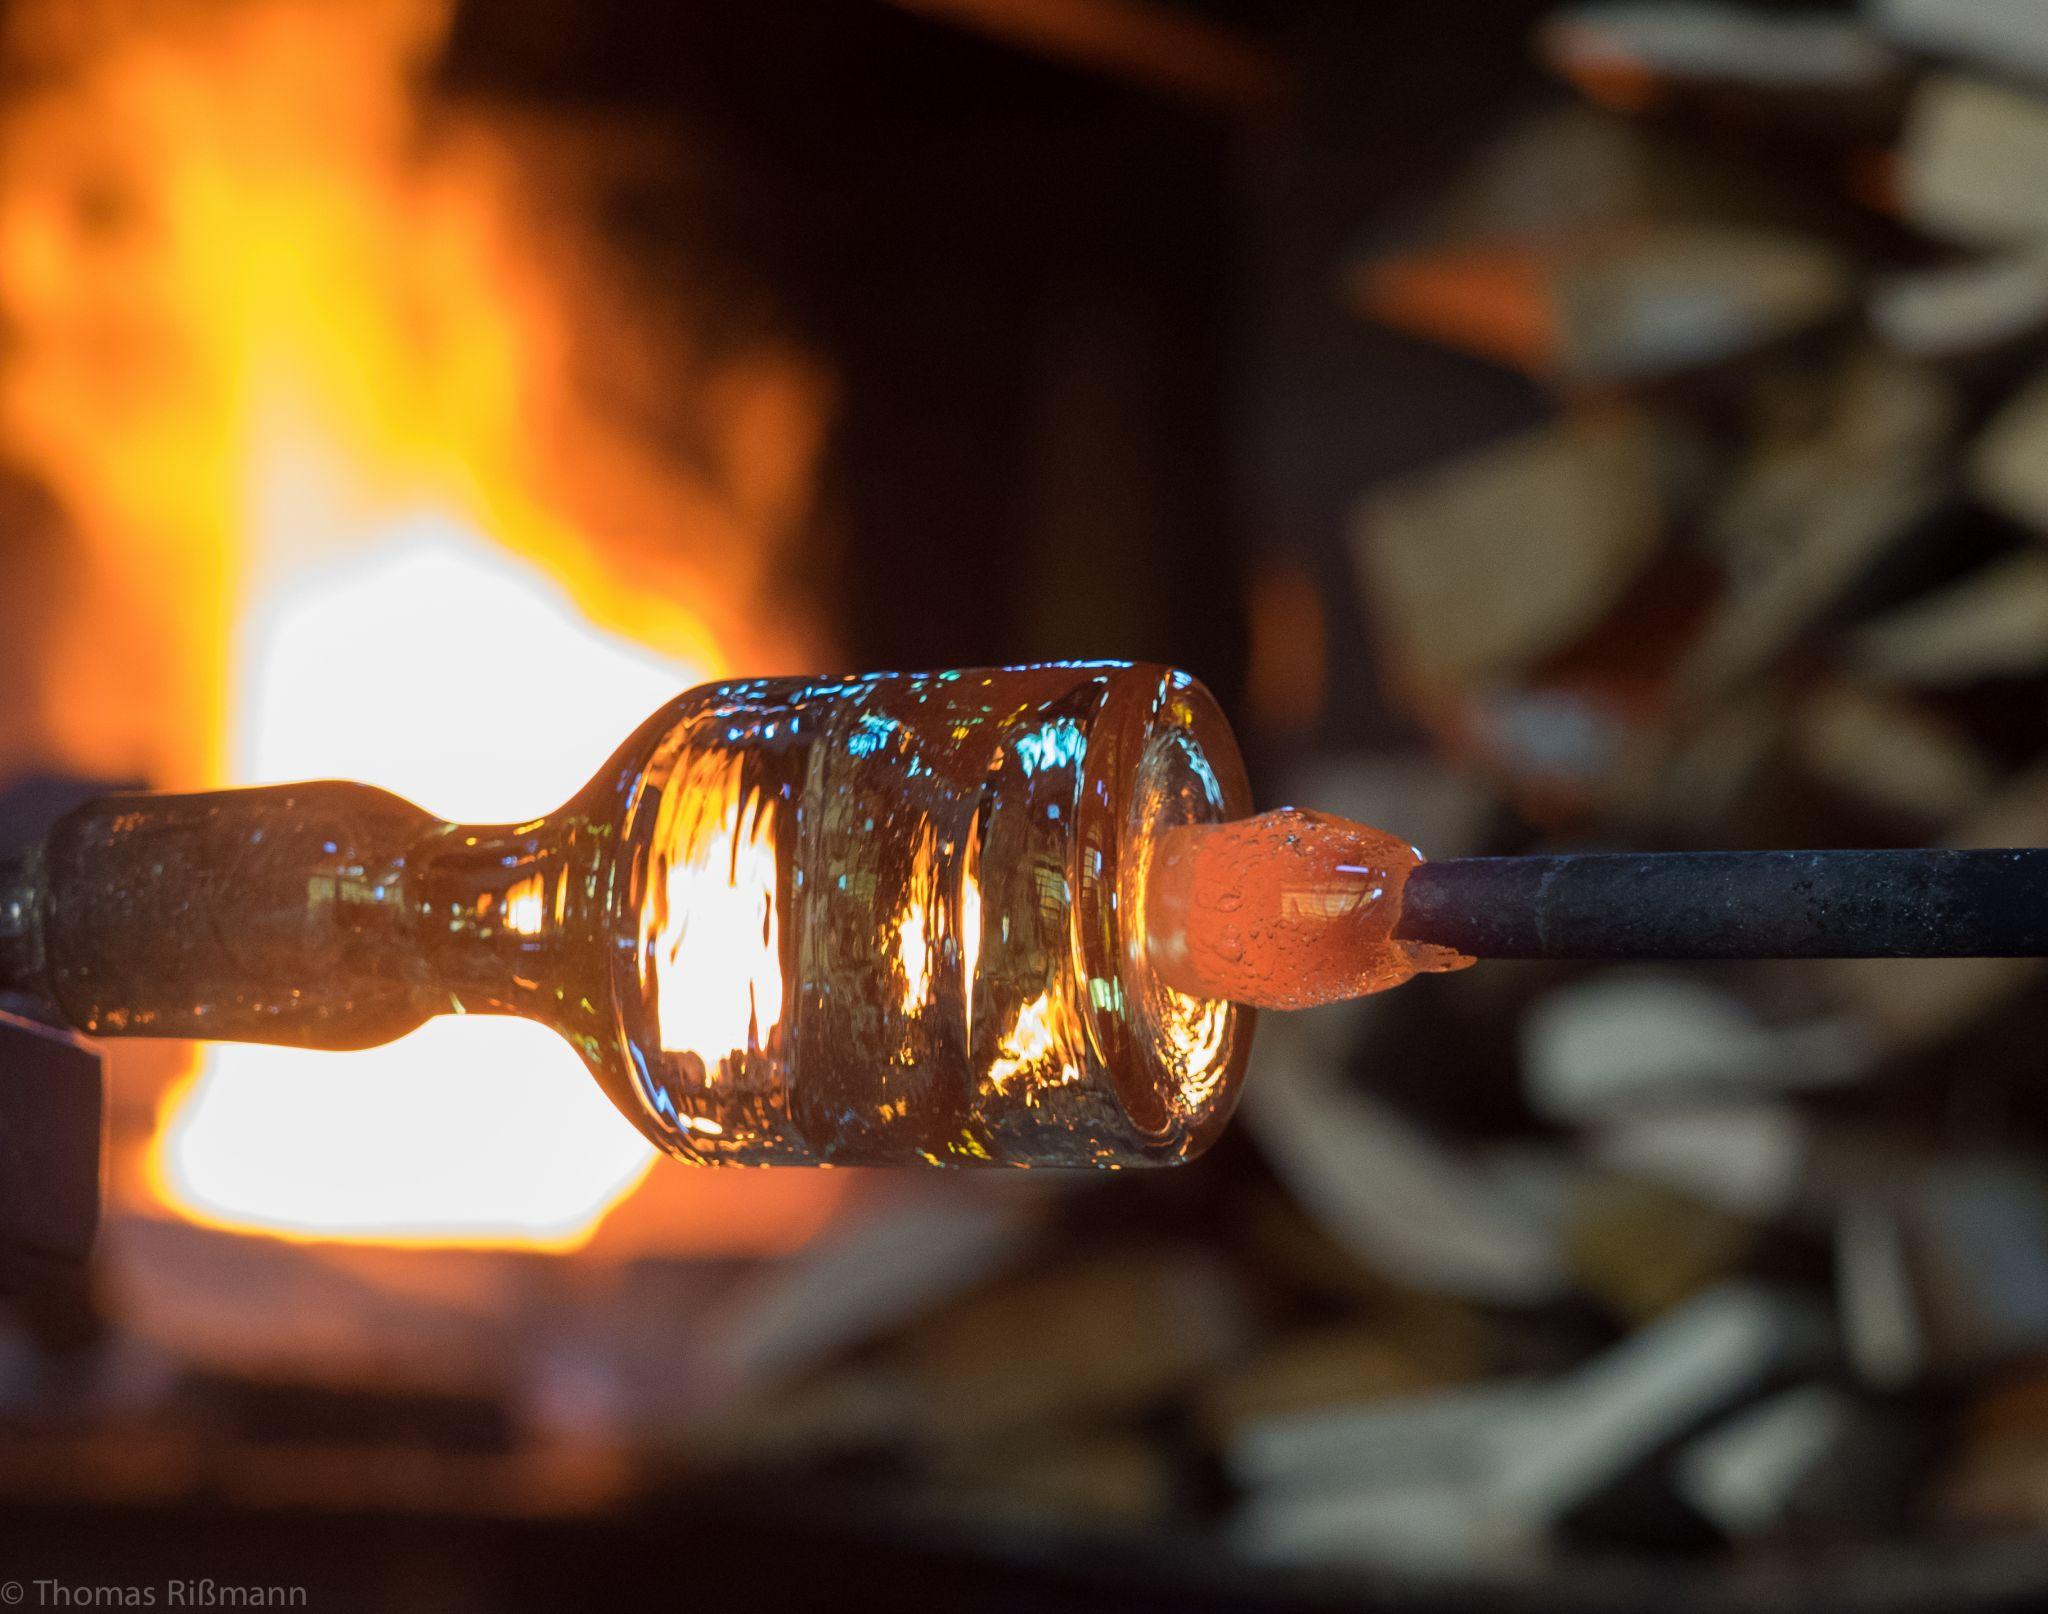 glassblowery gordiola, Spain